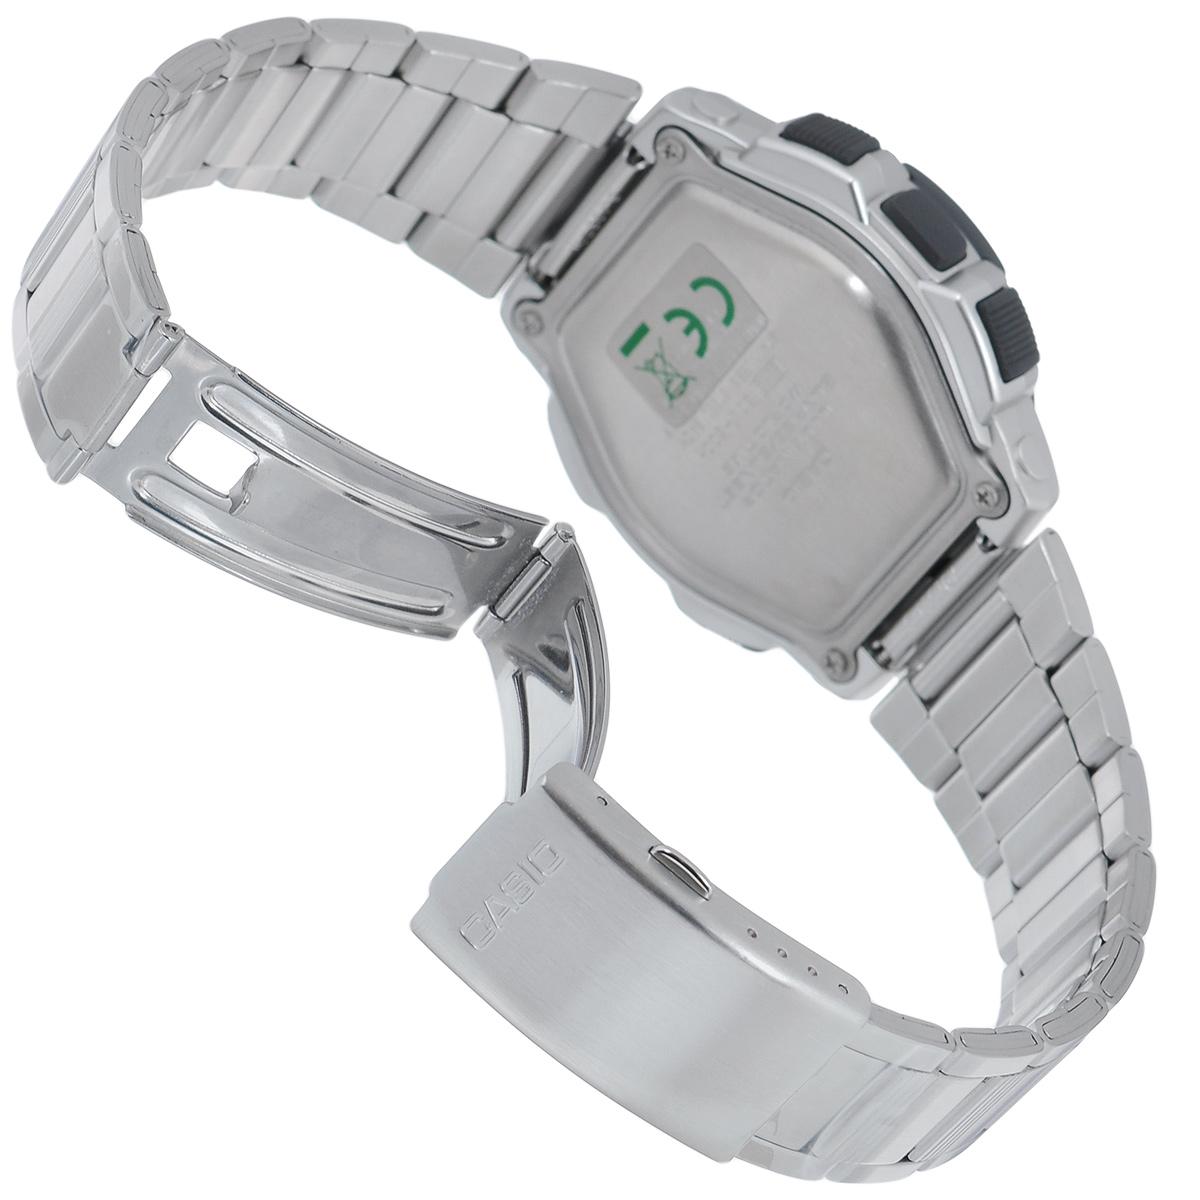 "Часы мужские наручные ""Casio"", цвет: серебристый. SGW-500HD-1B ( SGW-500HD-1B )"